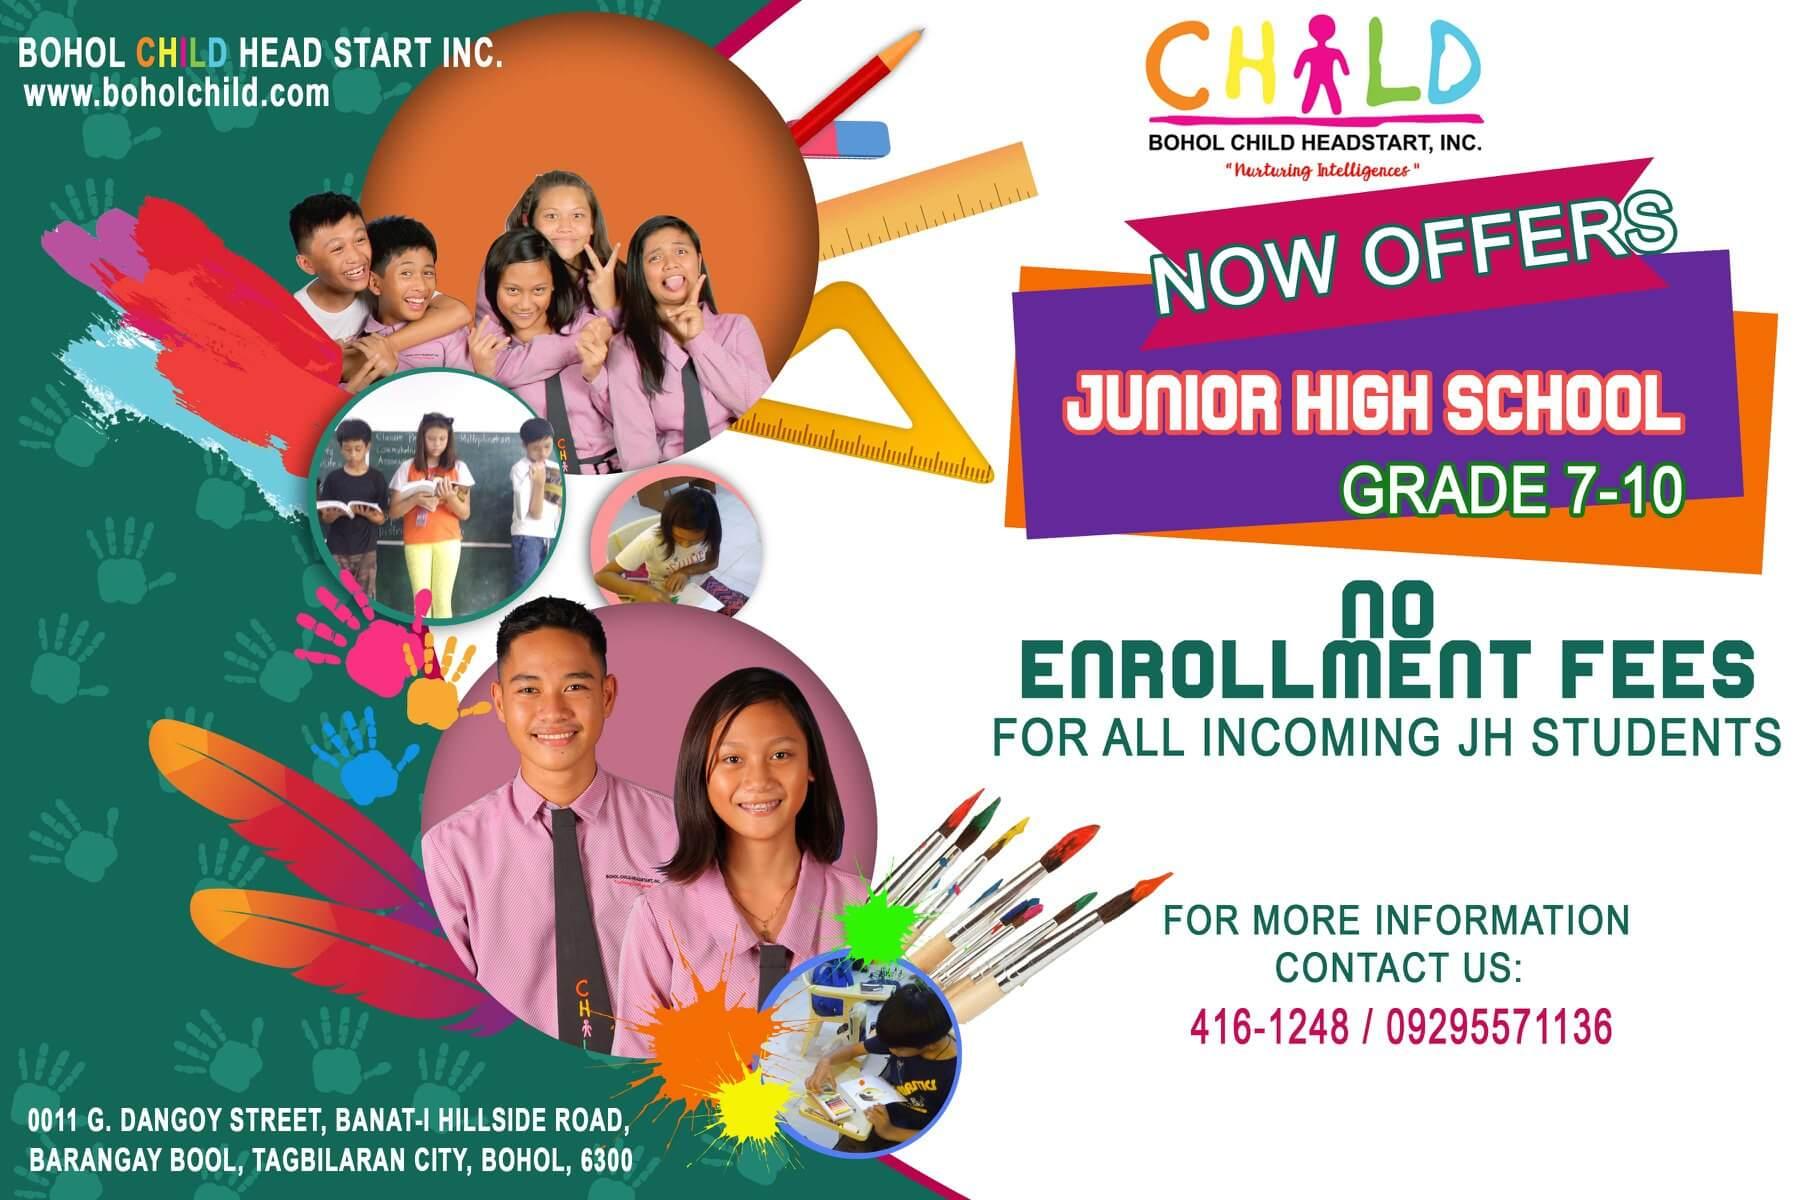 BCHS offers Junior High School (Grades 7-10)